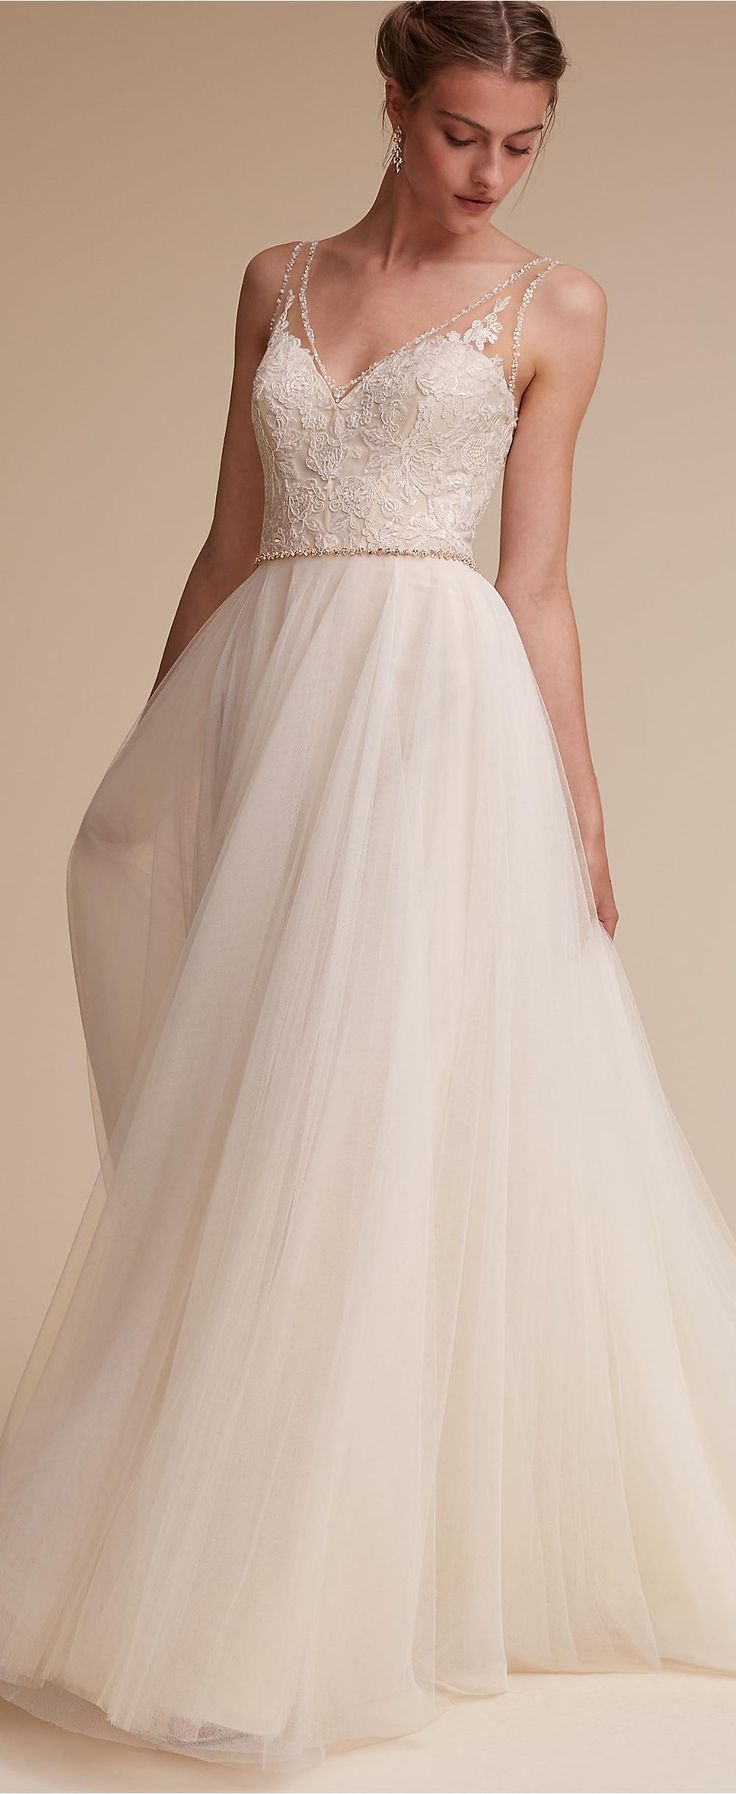 Ethereal wedding dress by BHLDN